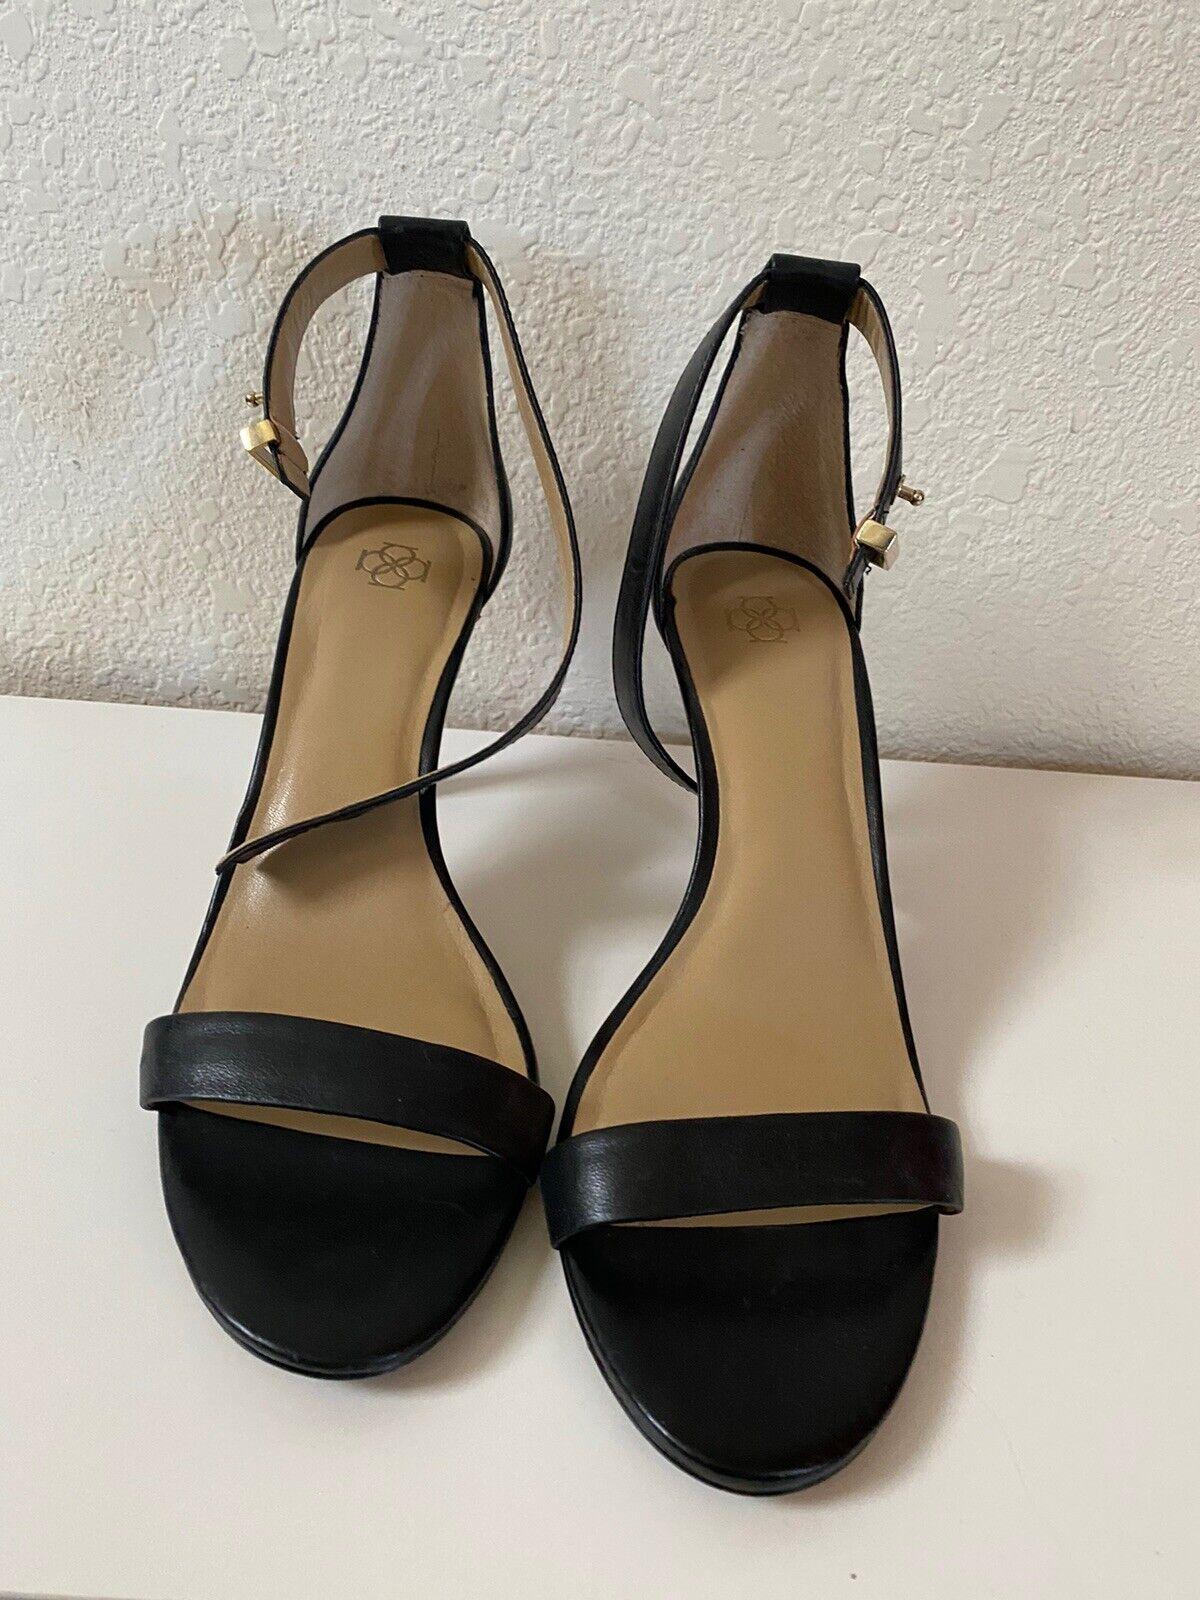 Ann Taylor Womens Heels 9.5 Leather black